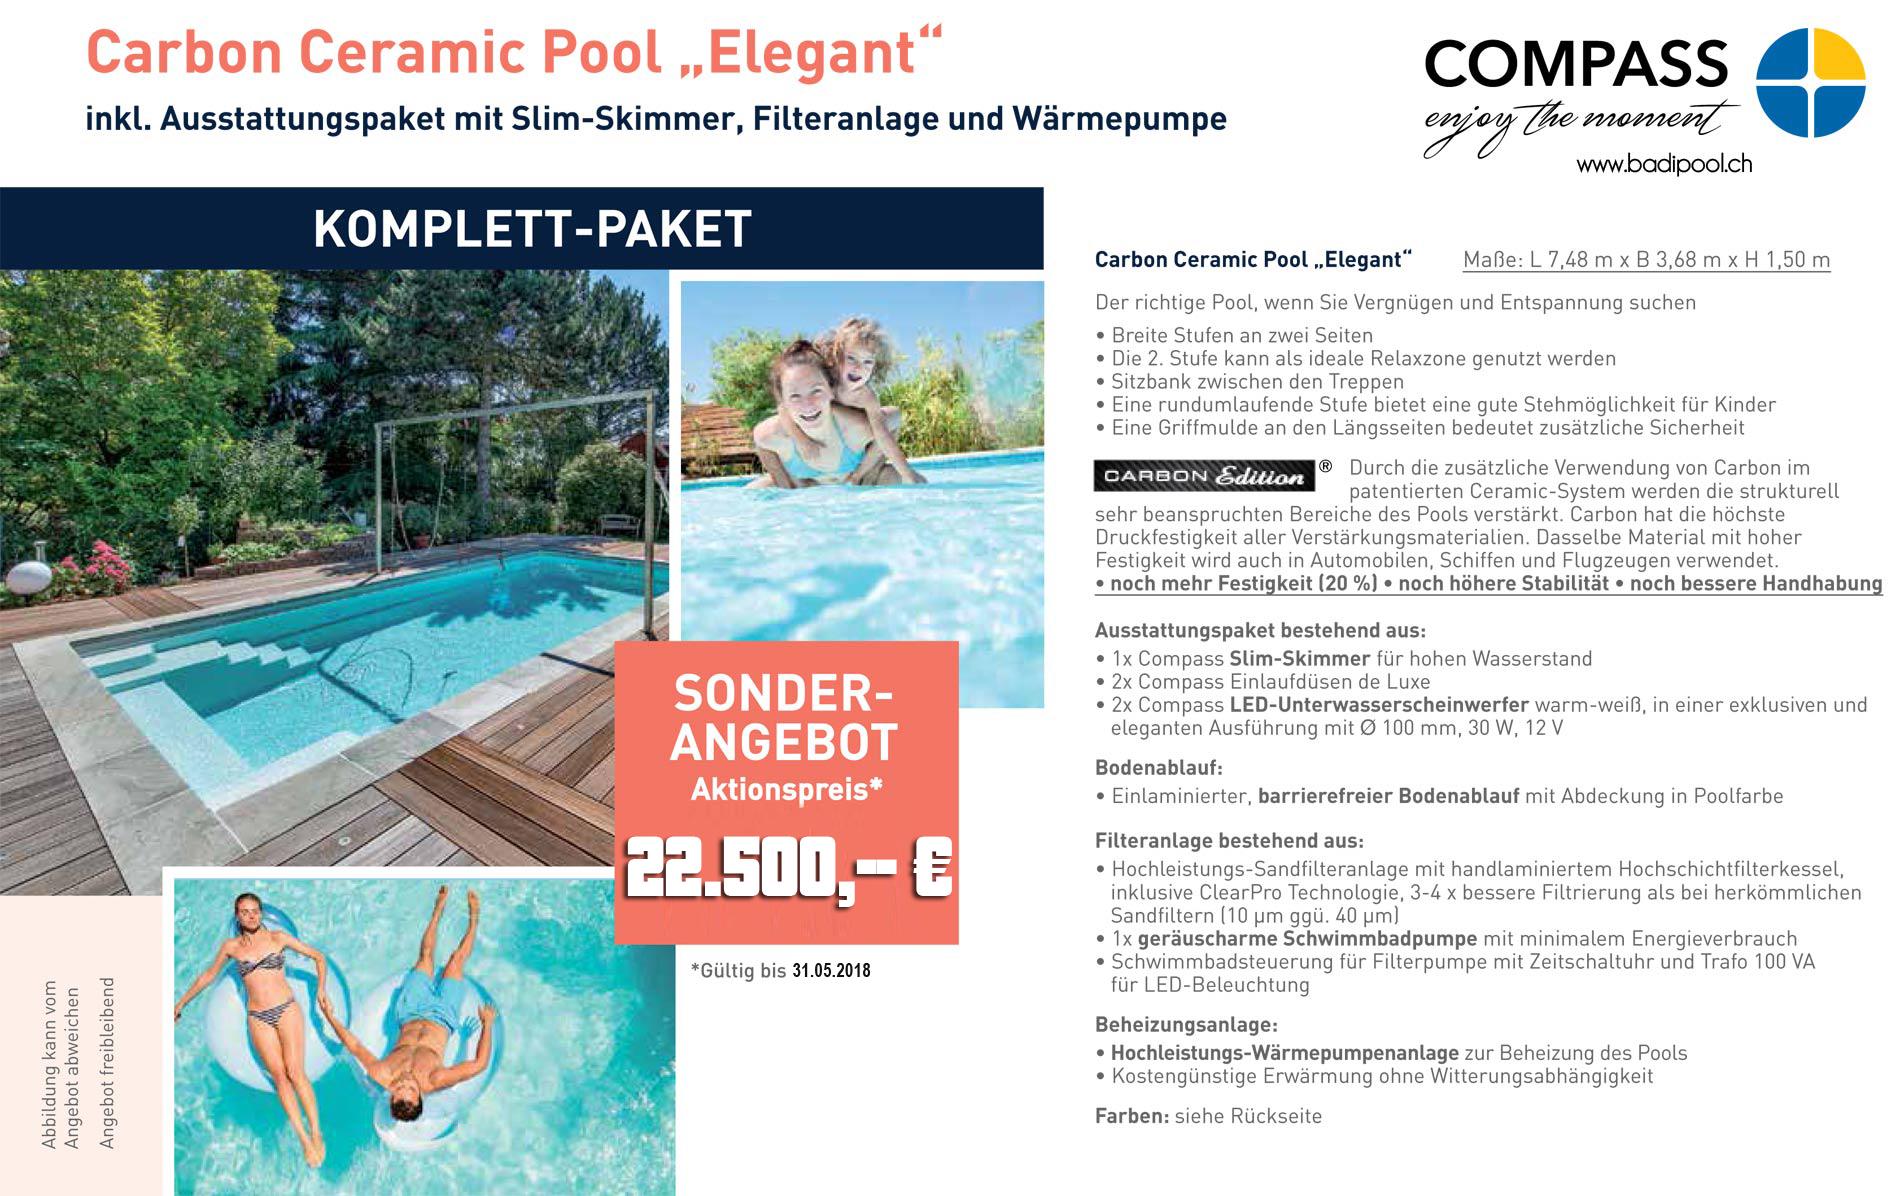 Compass pool elegant aktion 2018 compasspools schweiz for Pool im angebot